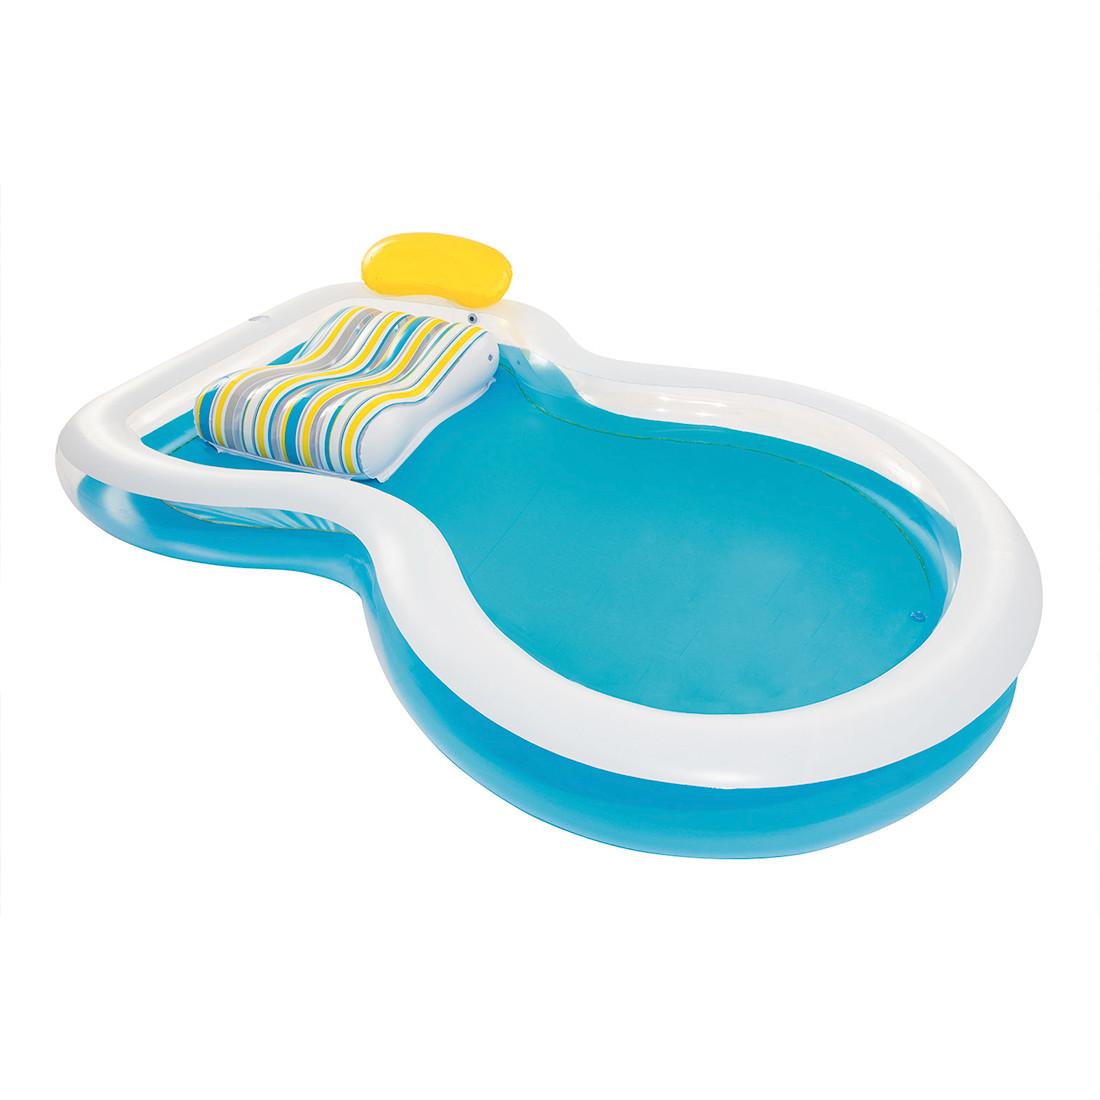 Семейный надувной бассейн Staycation 279 х 234 х 48 см, BESTWAY, 54168